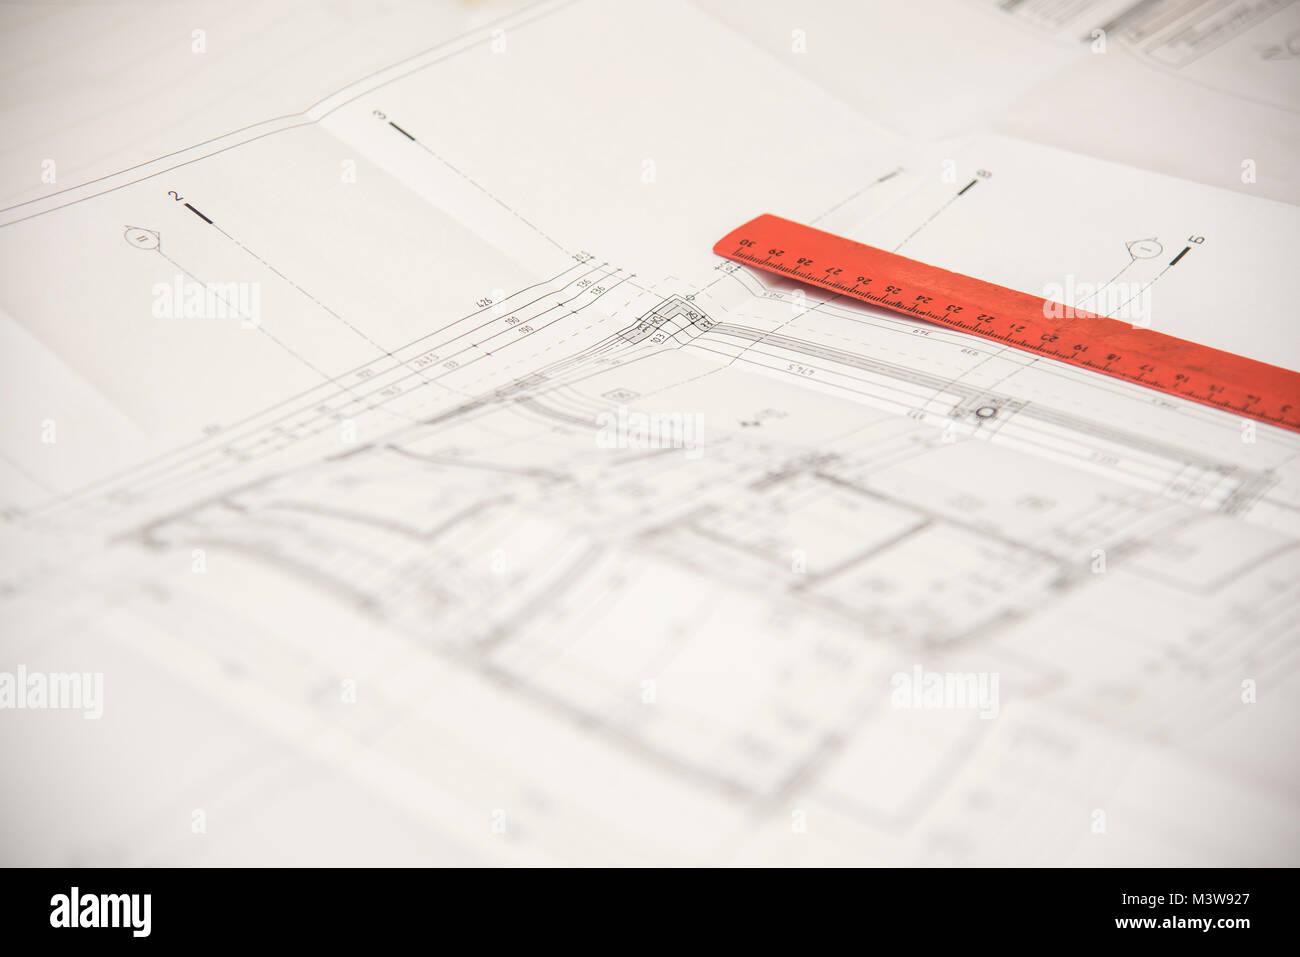 Build house draw blueprint stock photos build house draw blueprint building and construction blueprints stock image malvernweather Choice Image